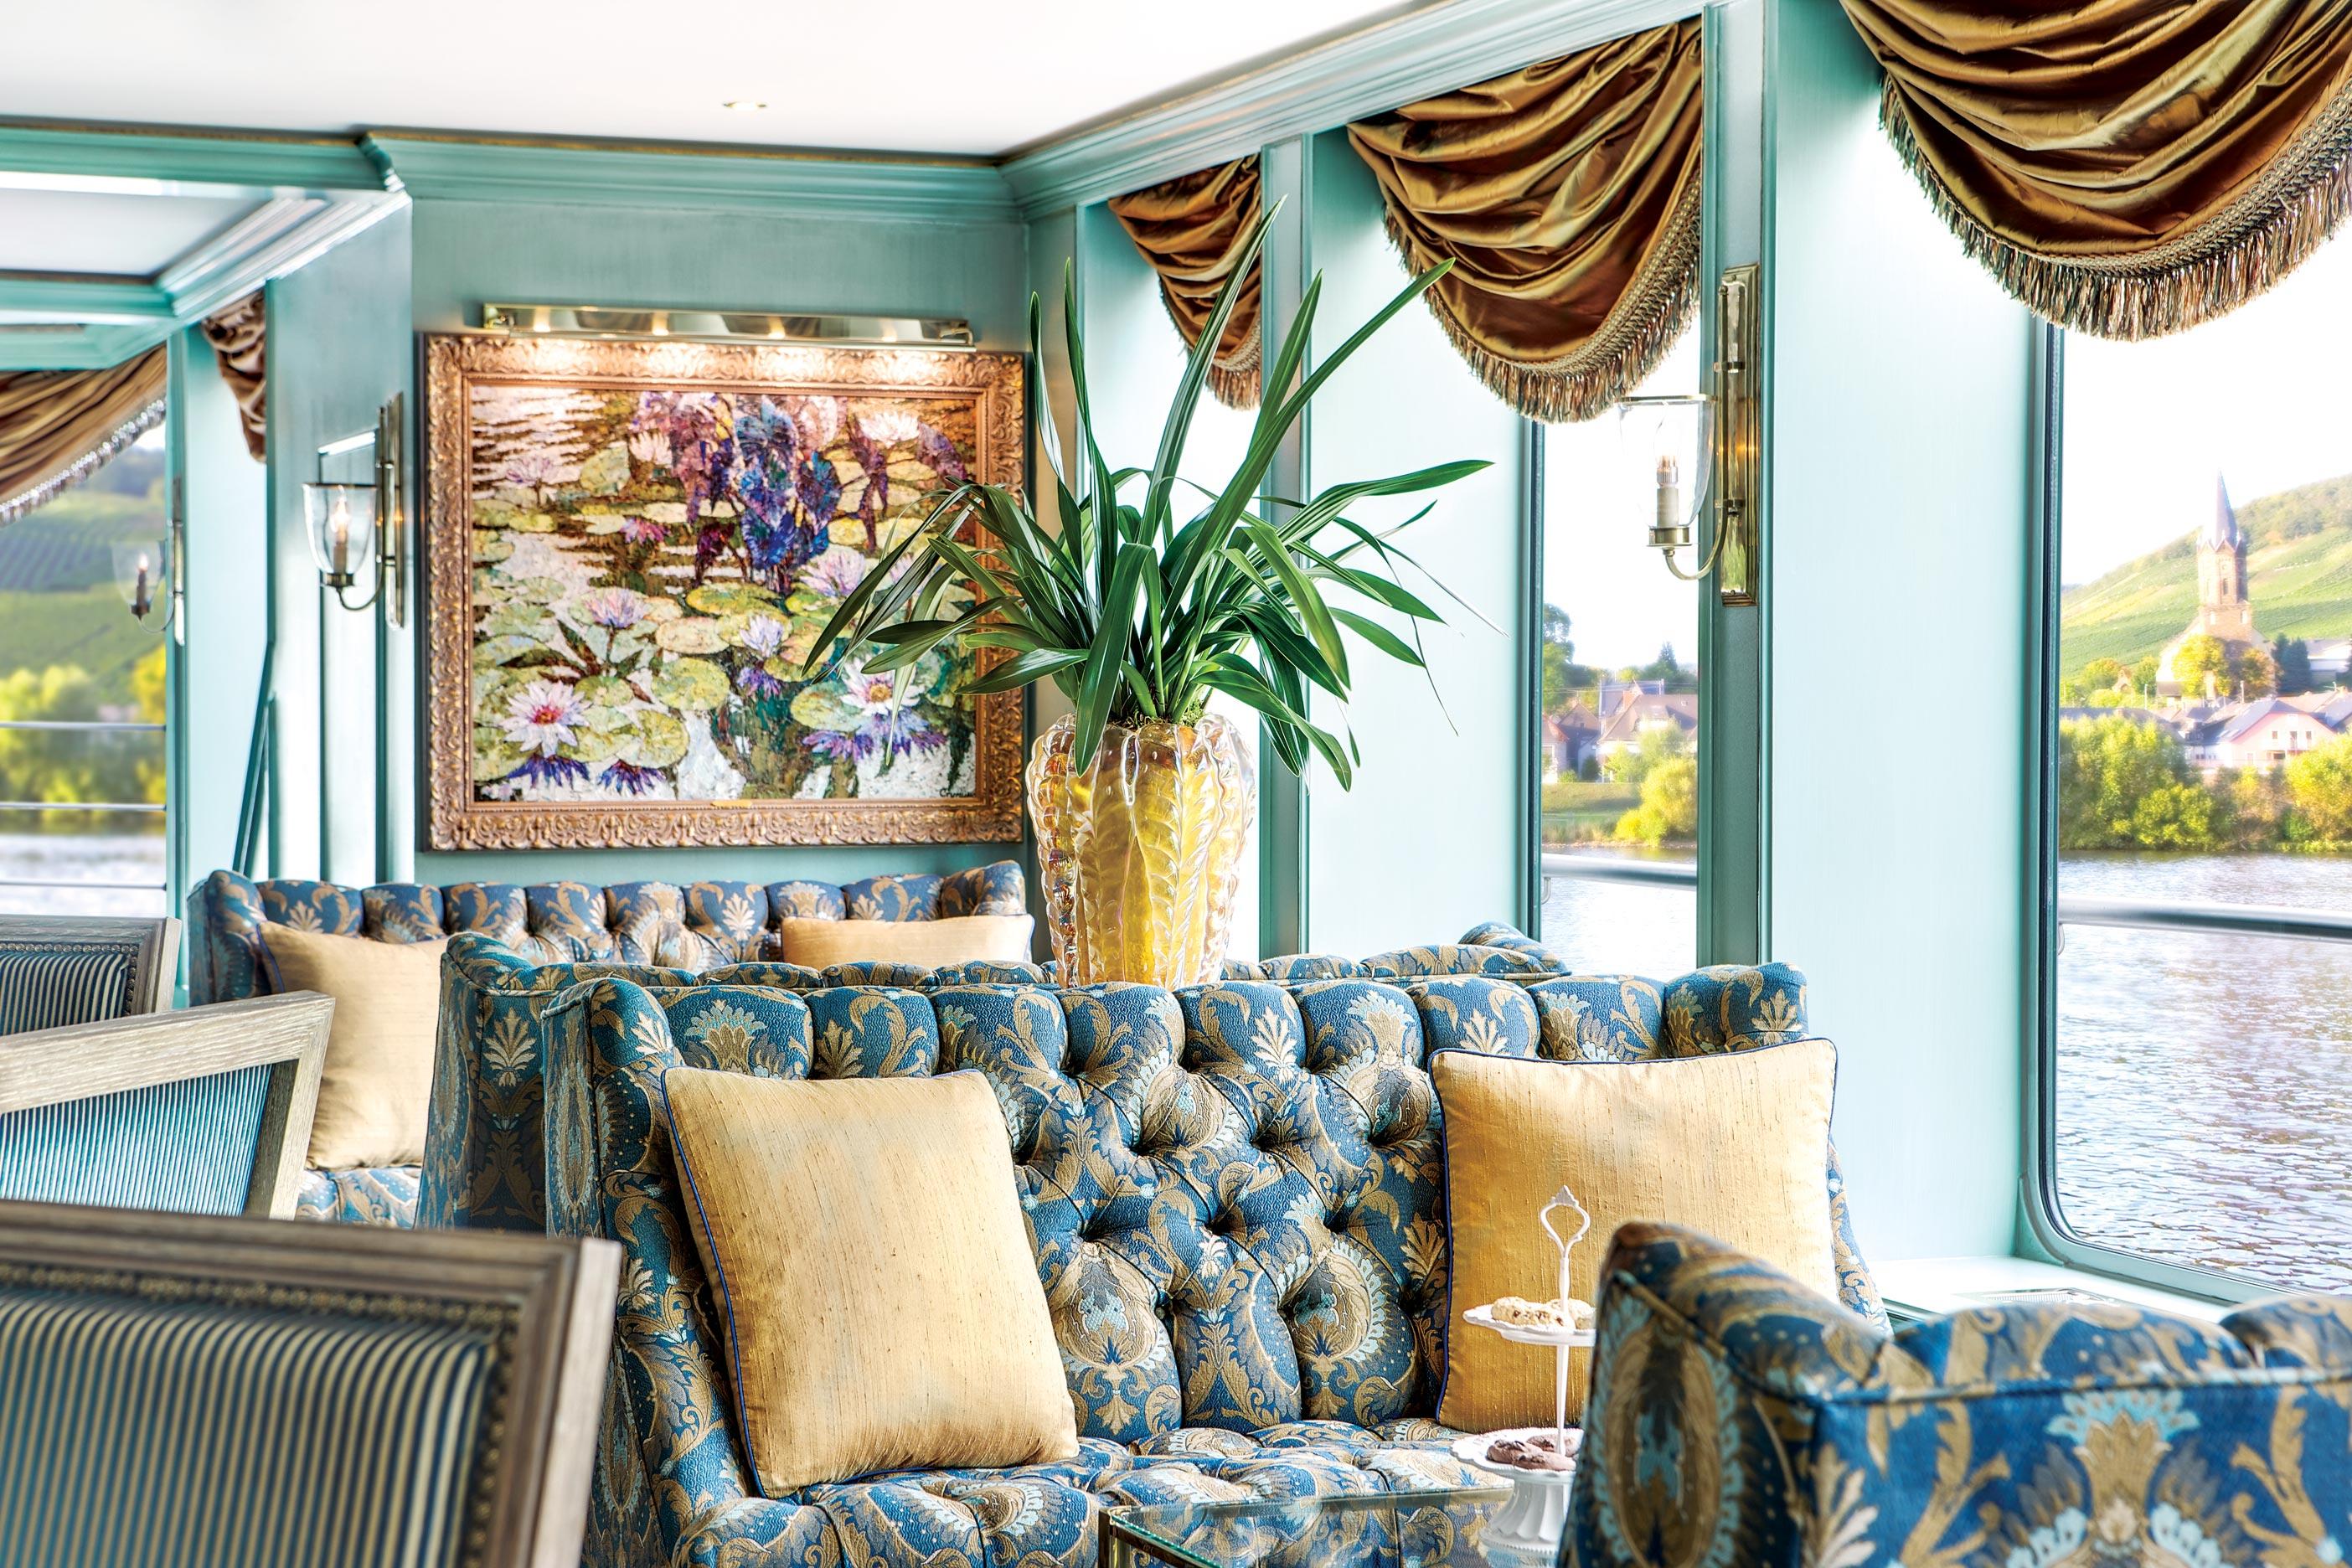 Uniworld's River Empress Lounge